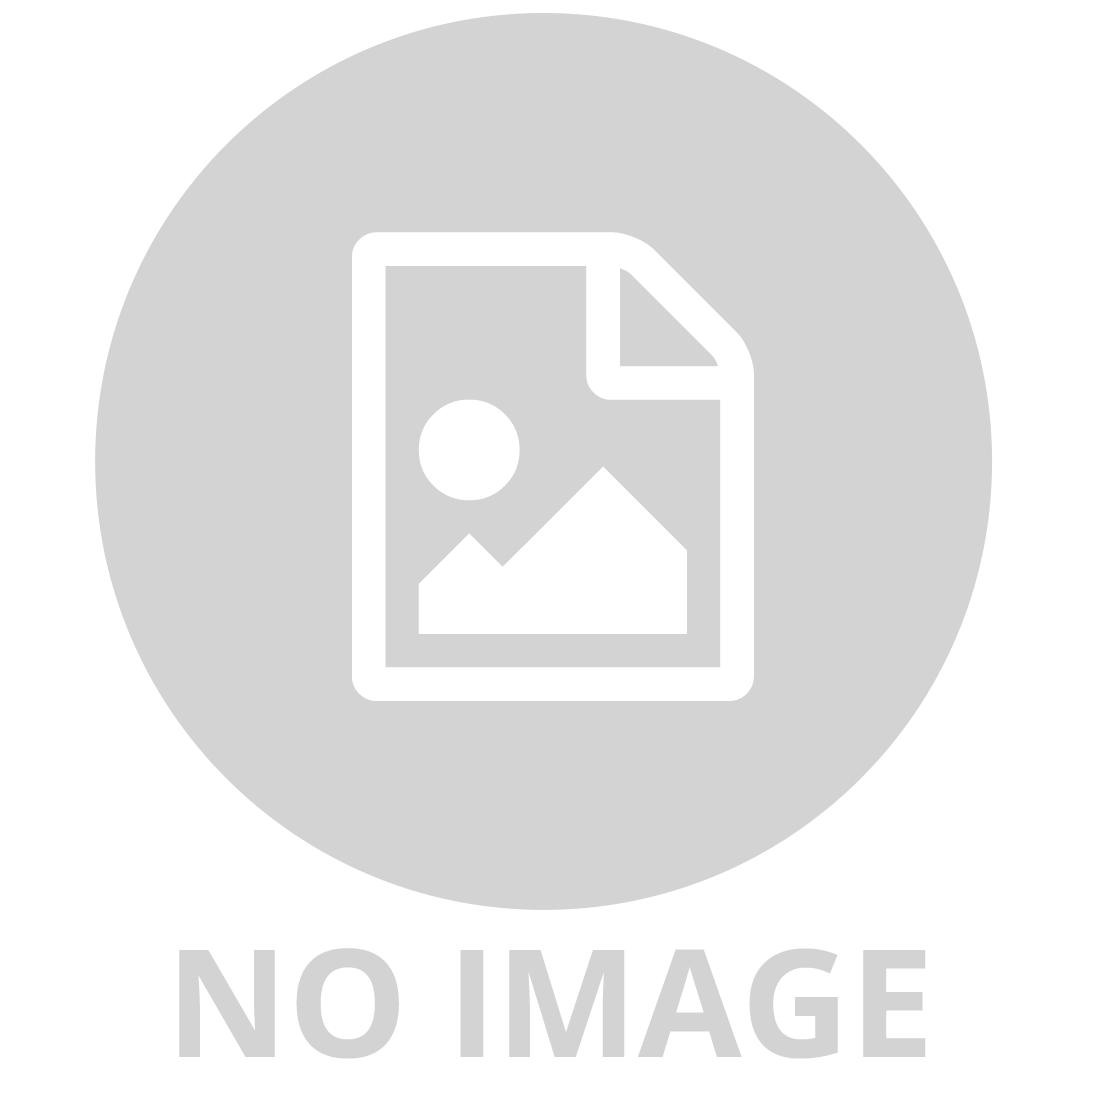 LEGO DC 76117 BATMAN MECH VS POISON IVY MECH